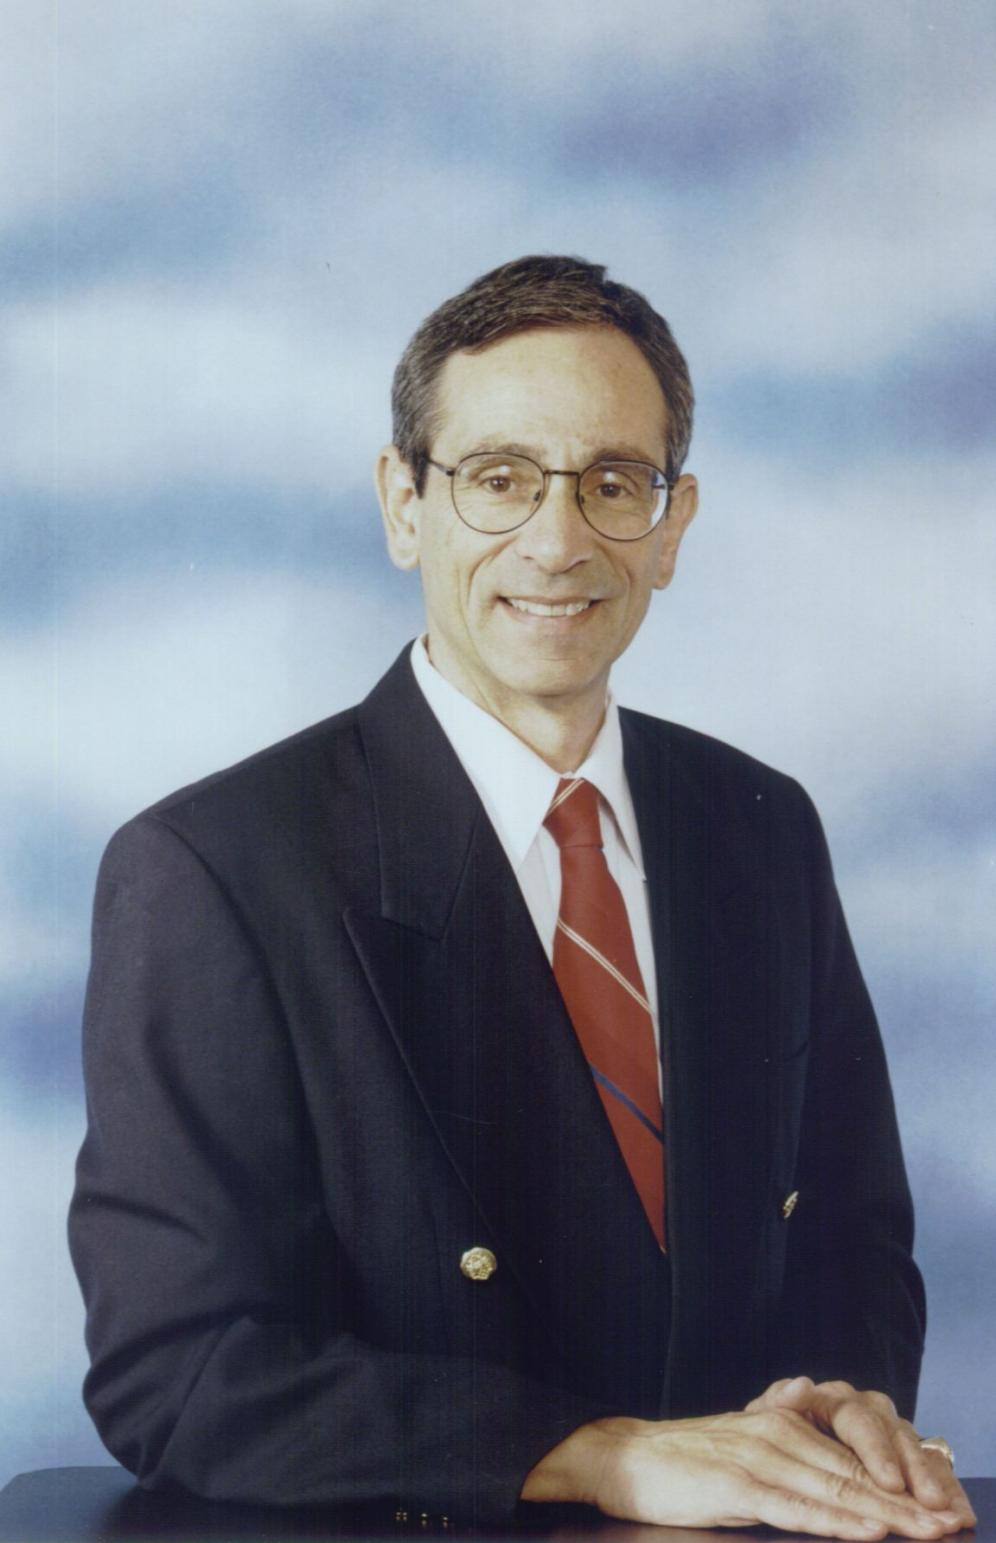 Robert Barrows, President, R.M. Barrows, Inc. Advertising & Public Relations